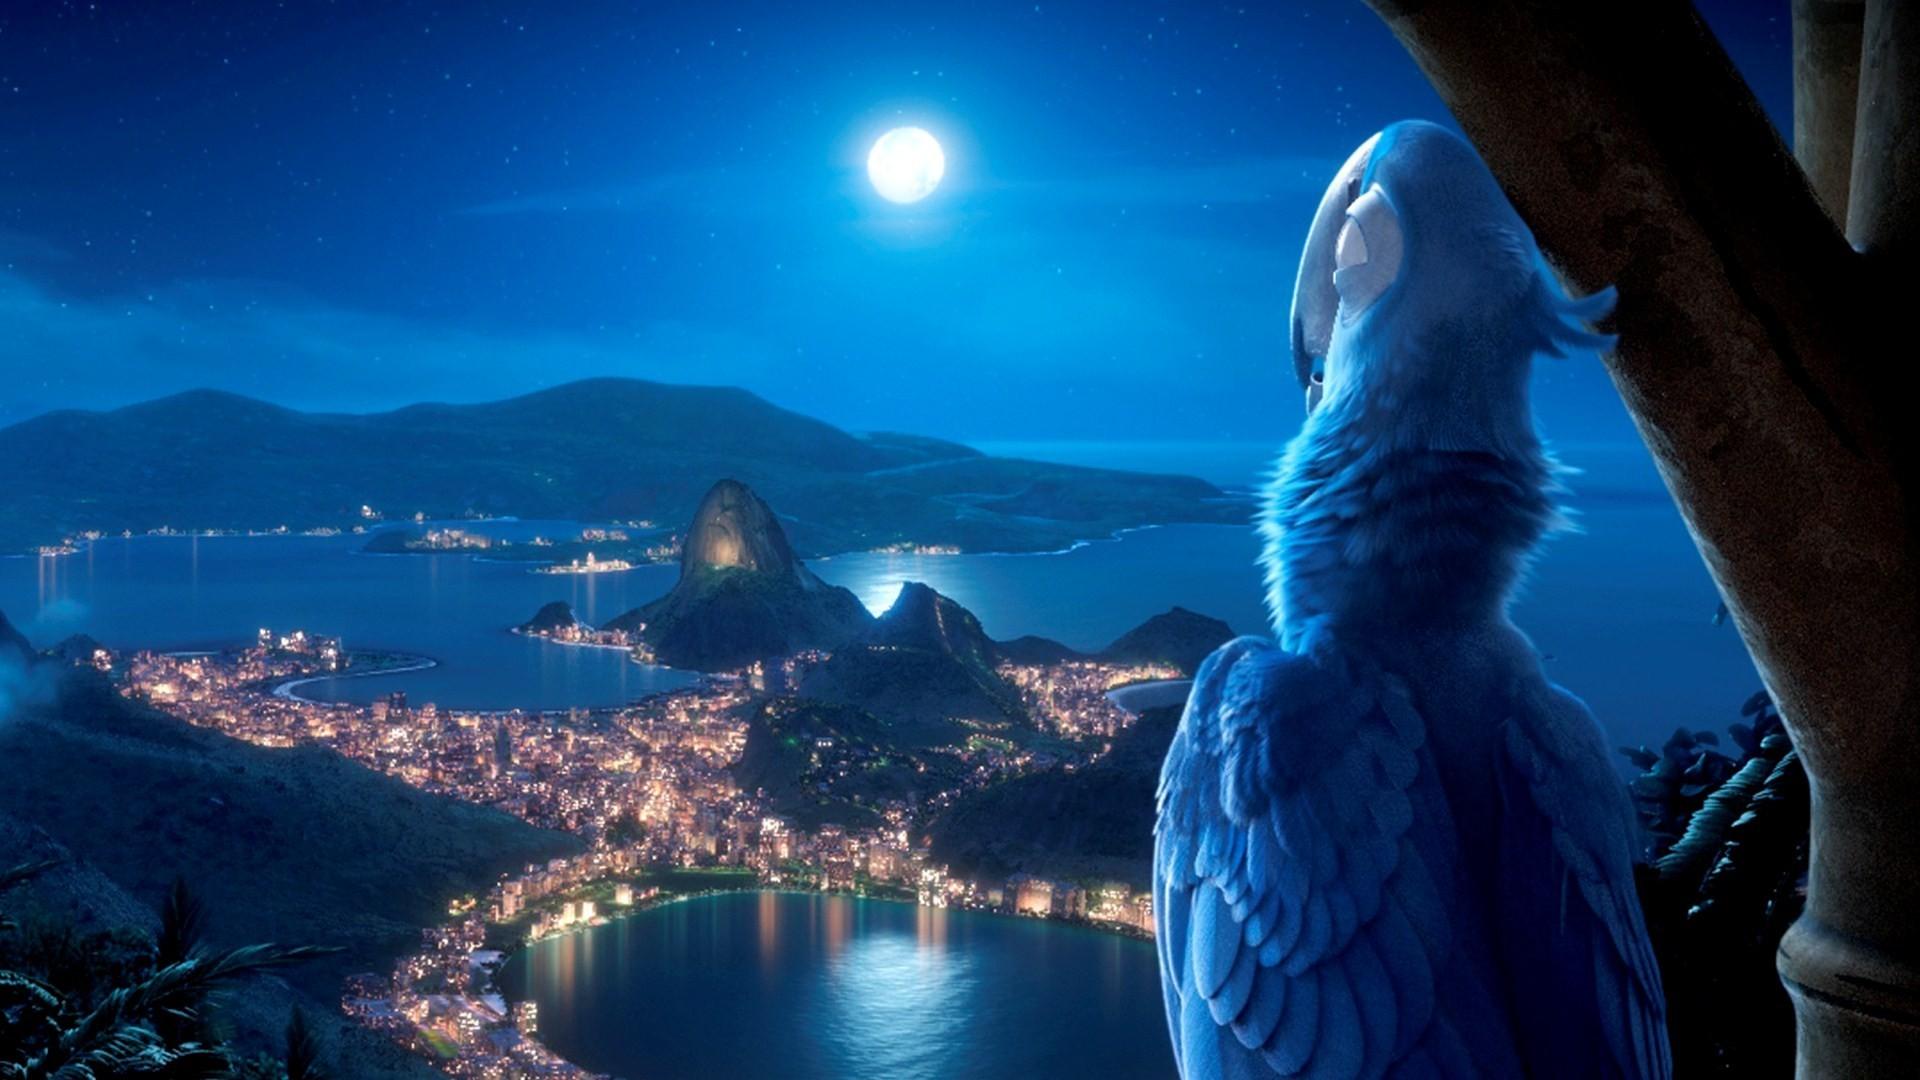 Rio backdrop